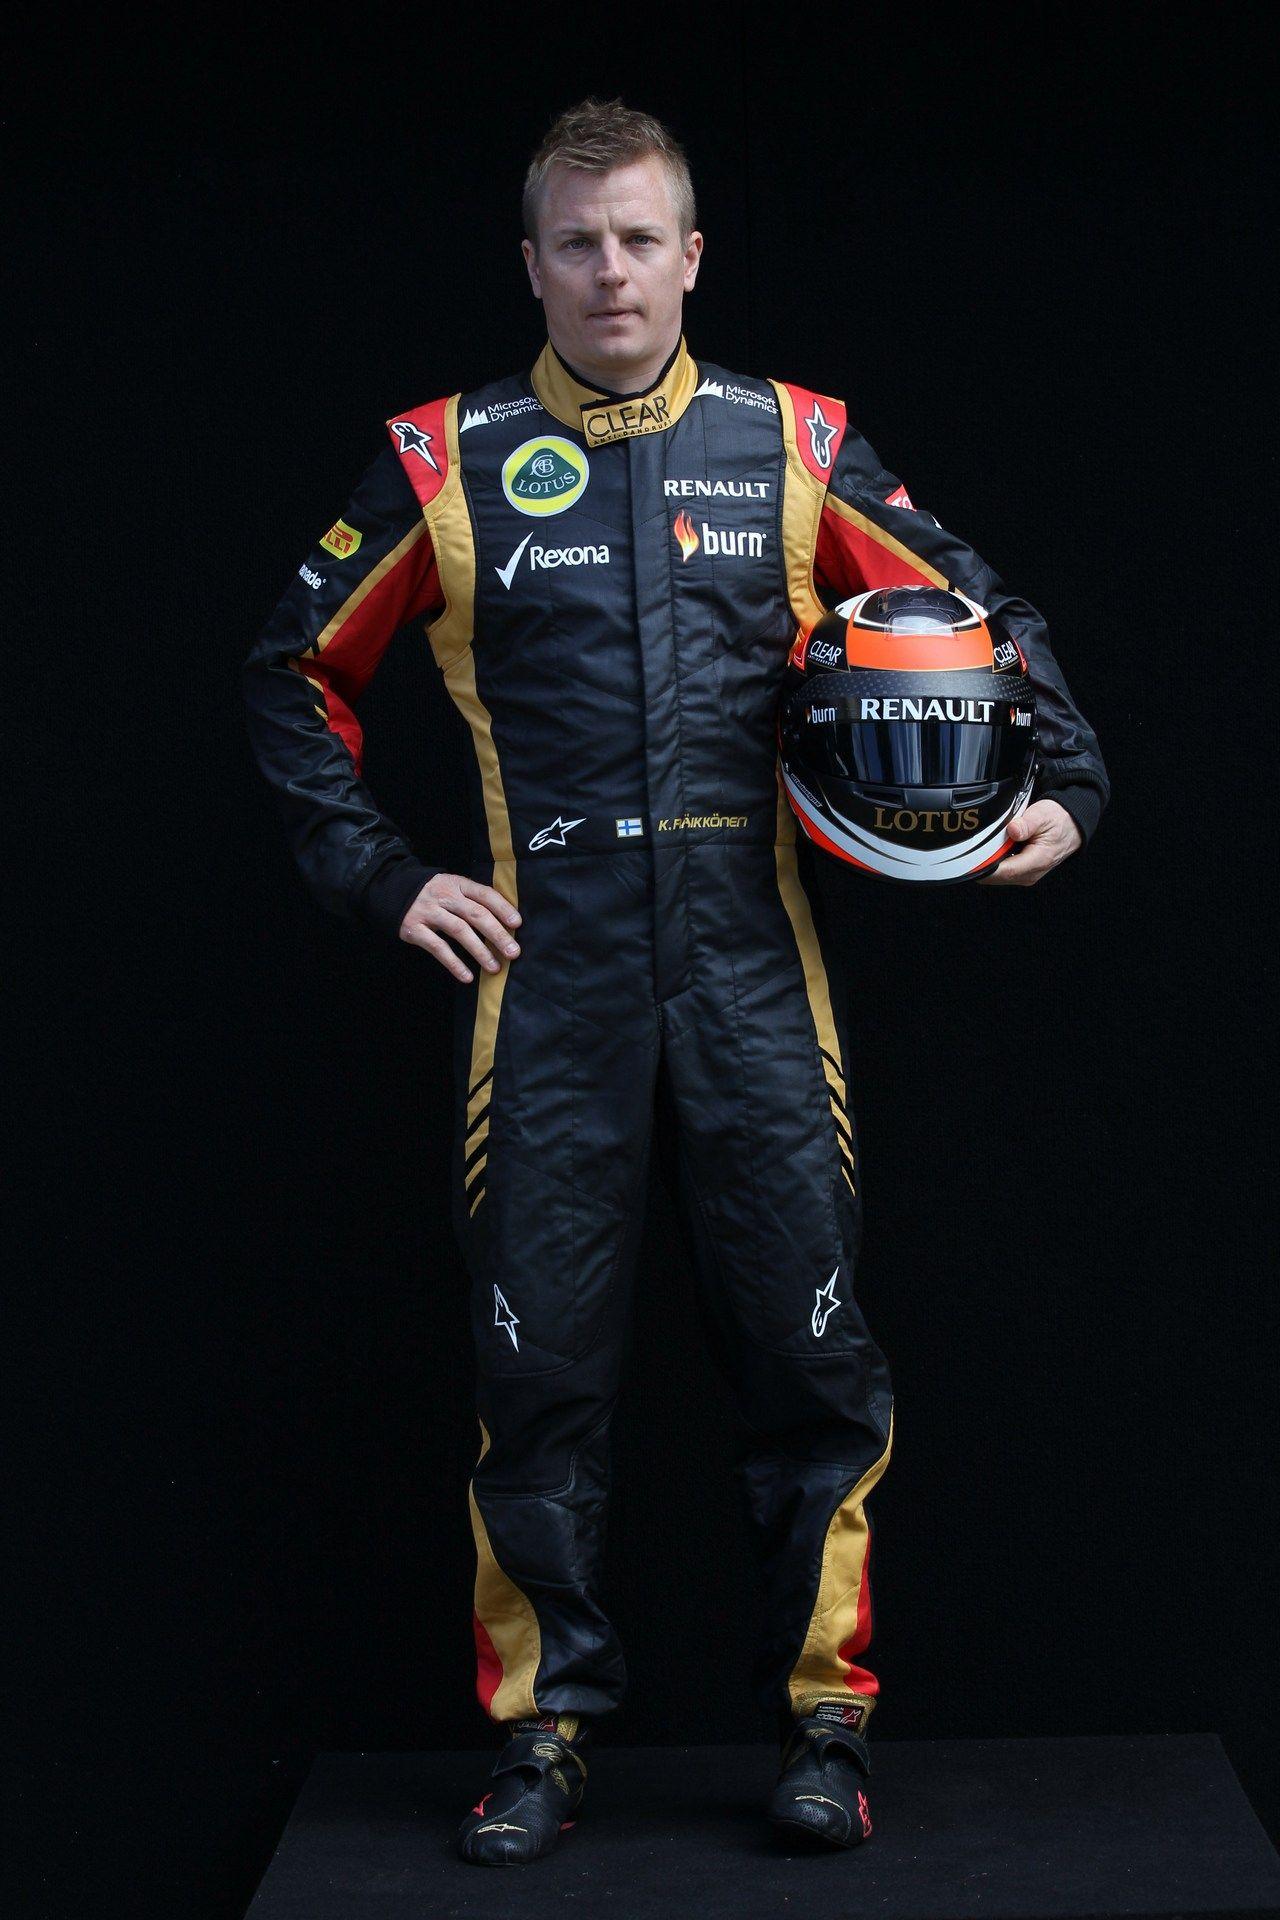 Round 1, Rolex Australian Grand Prix 2013, Preparation, #7 Kimi Raikkonen (FIN), Driver, Lotus F1 Team